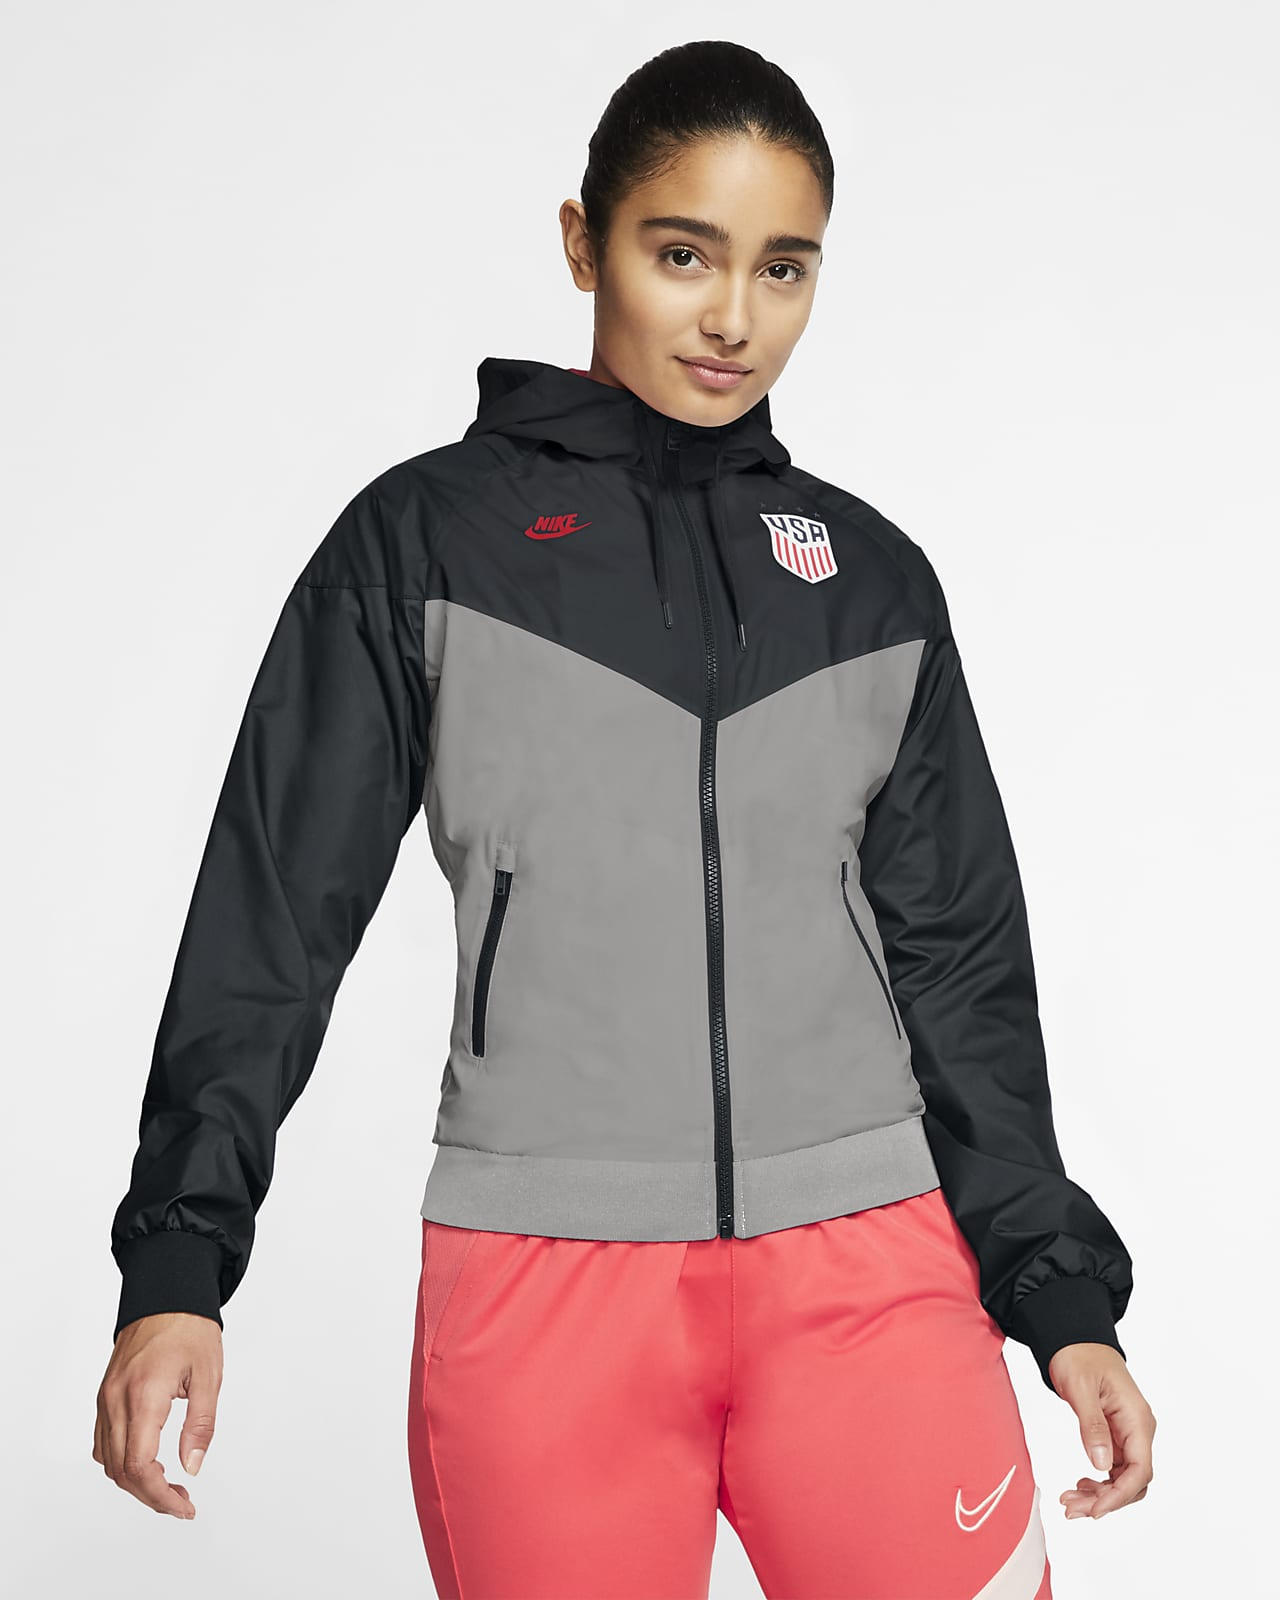 U.S. Windrunner Women's Jacket